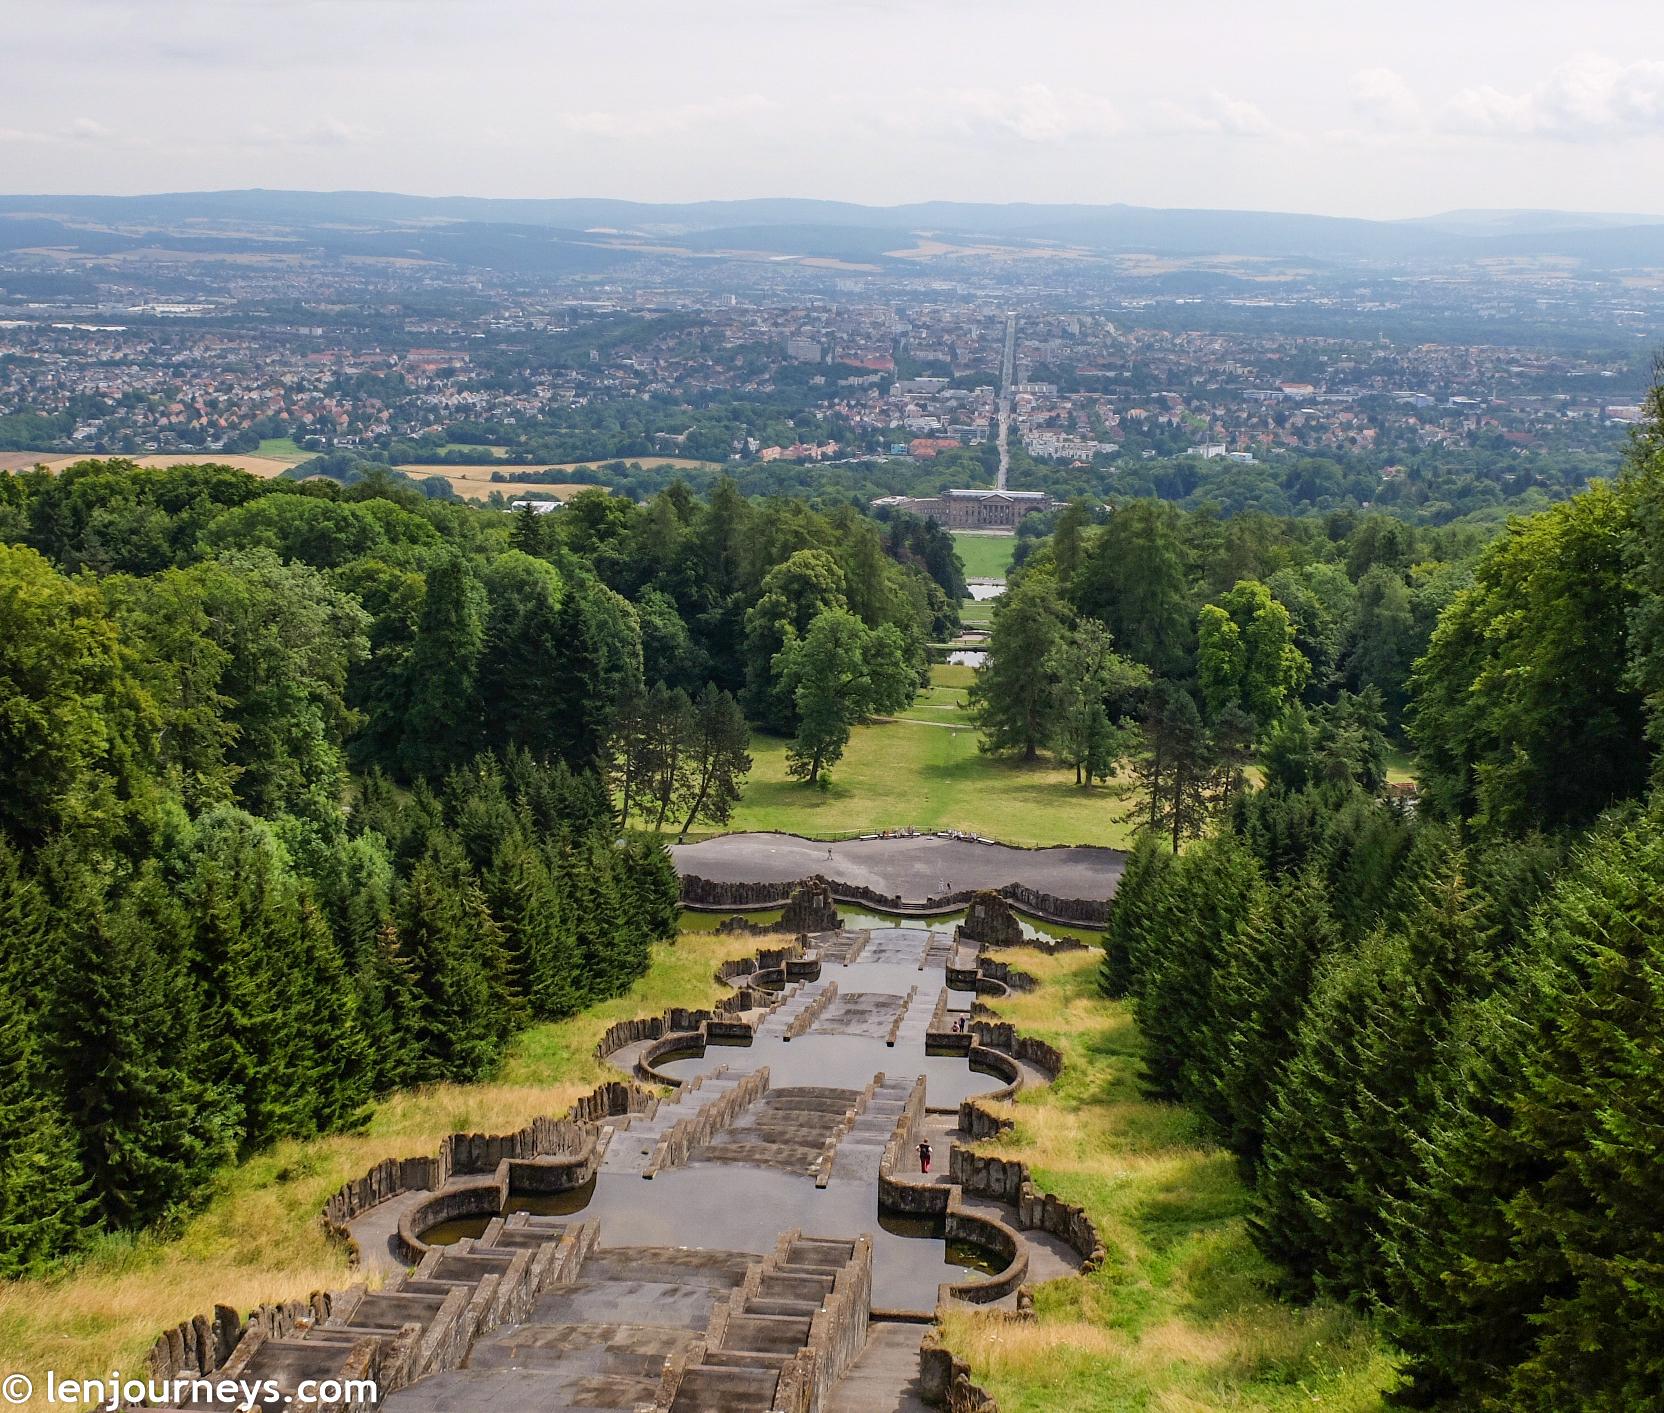 View from the summit of Bergpark Wilhelmshöhe